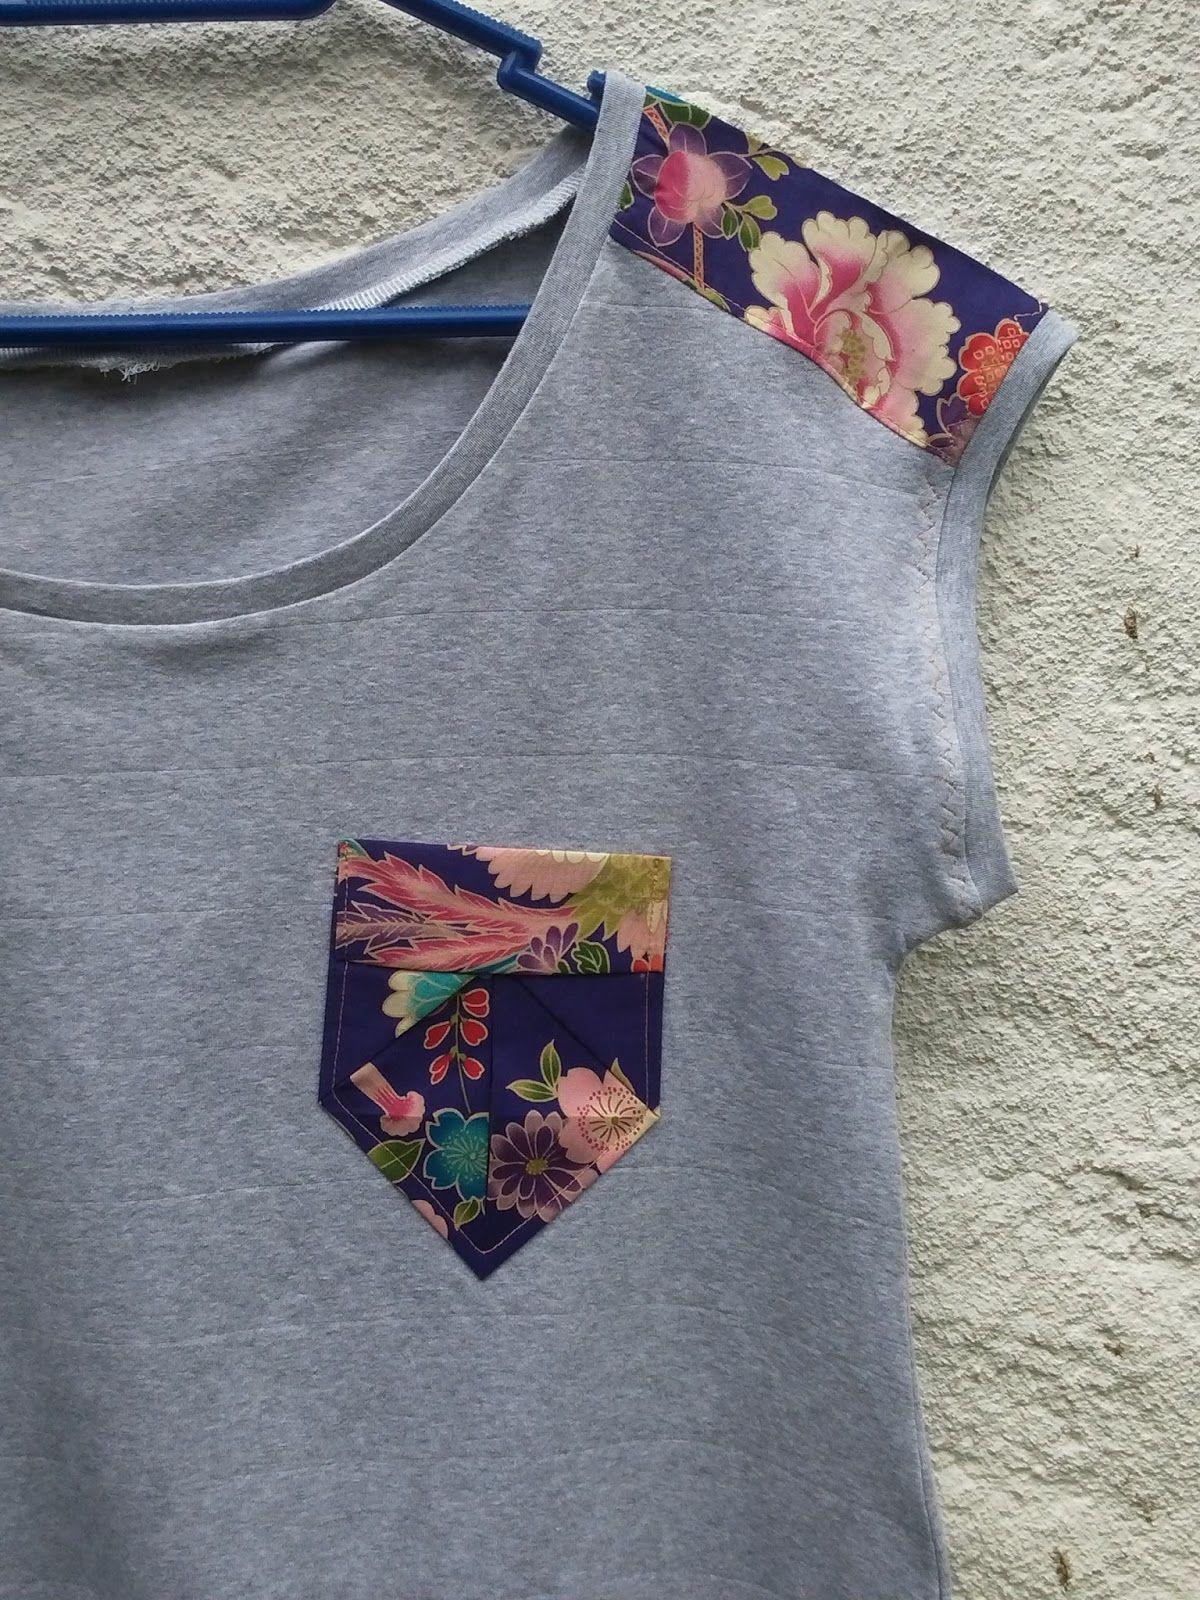 pandielleando diy bolsillo origami pimp up pinterest. Black Bedroom Furniture Sets. Home Design Ideas